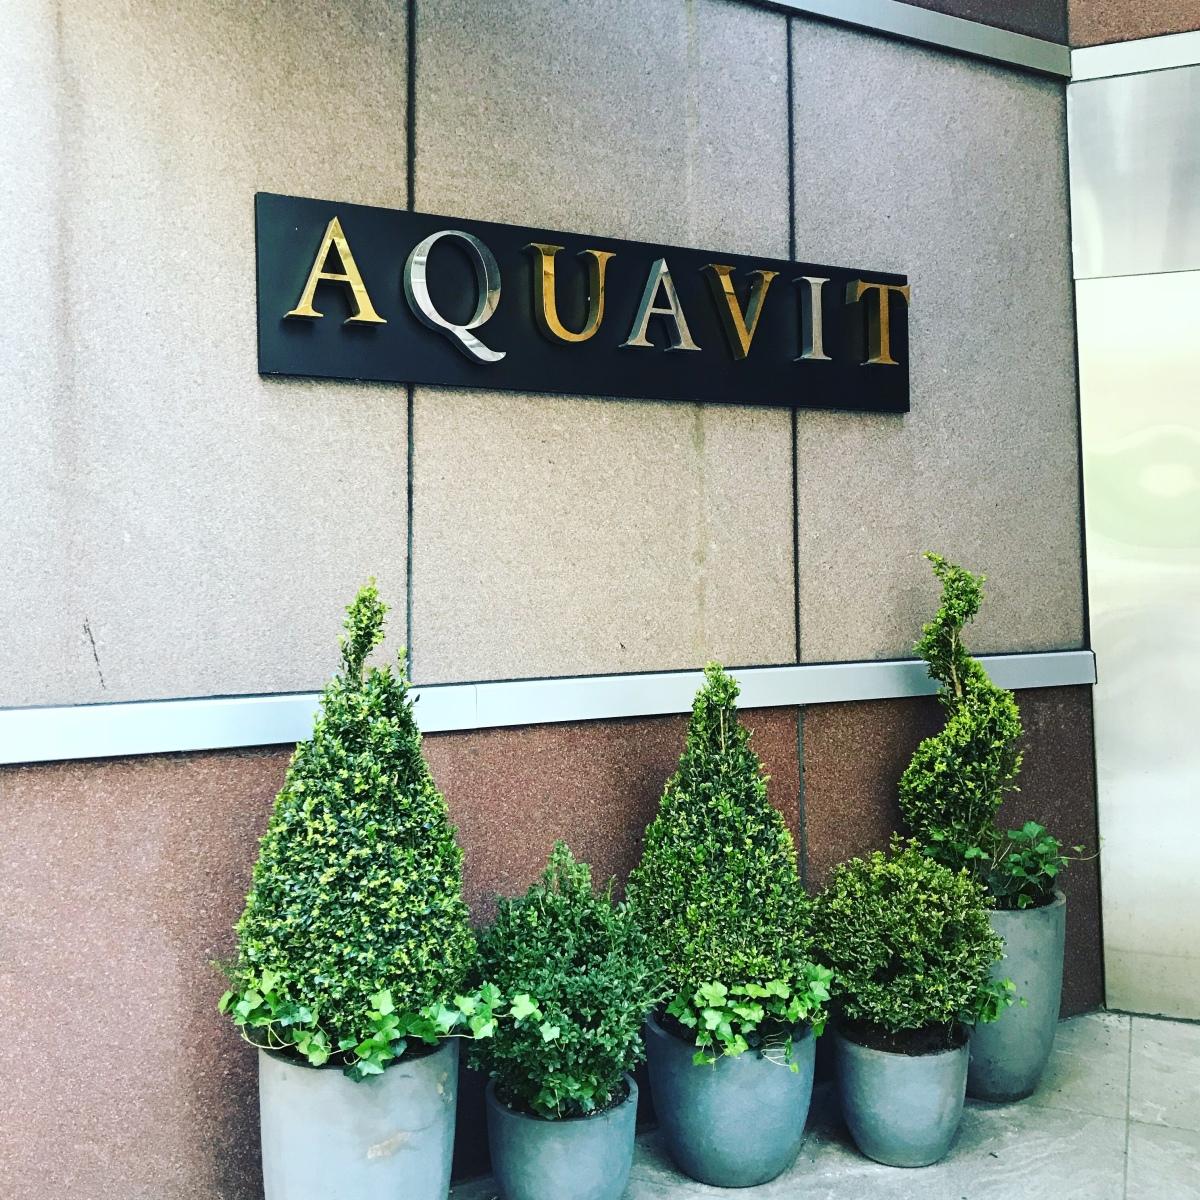 Restaurant review: Aquavit,NYC